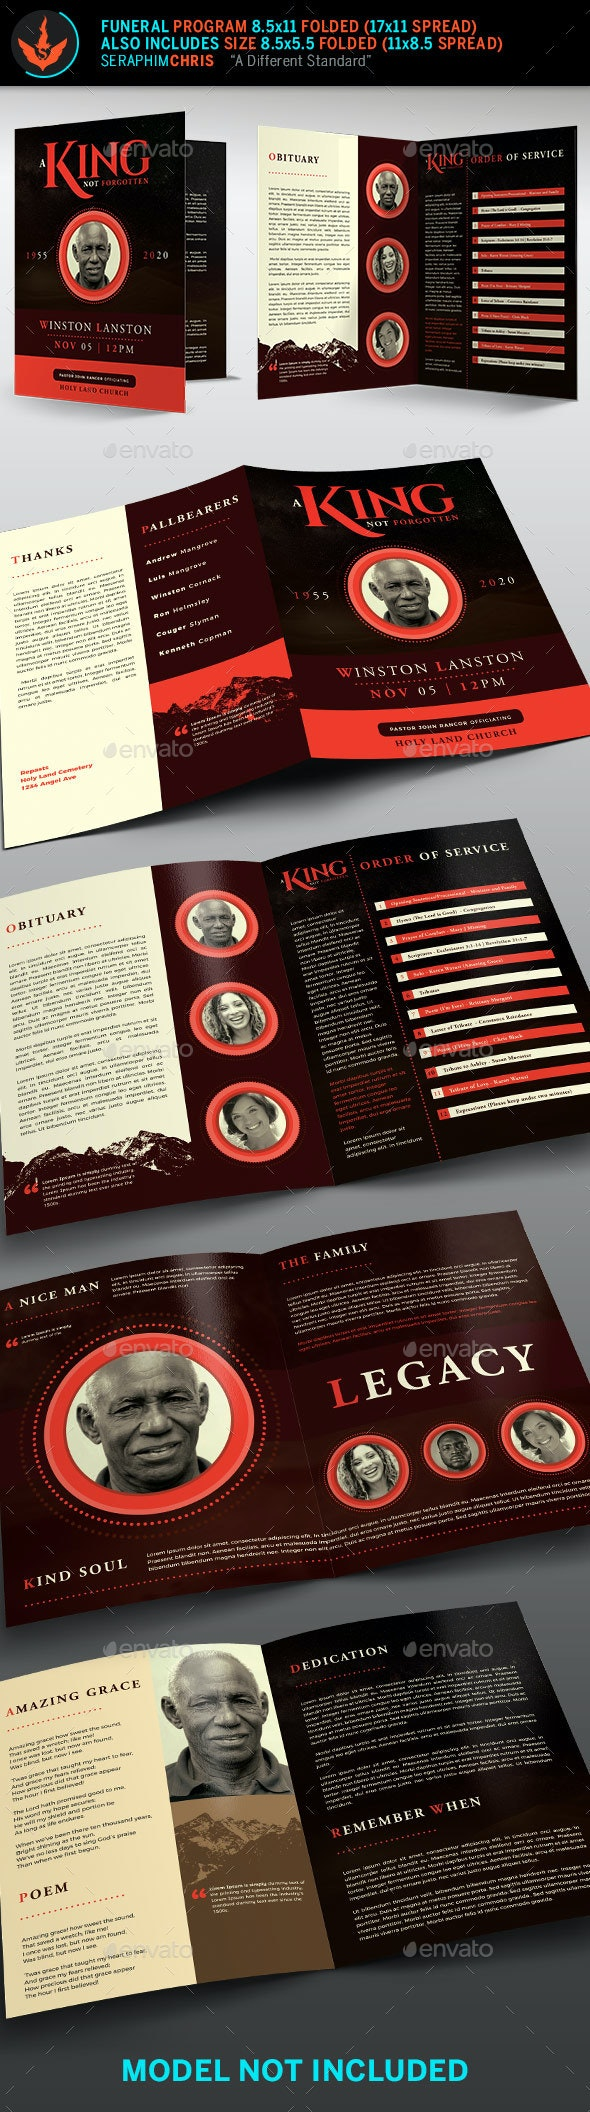 King Funeral Program Template - Informational Brochures